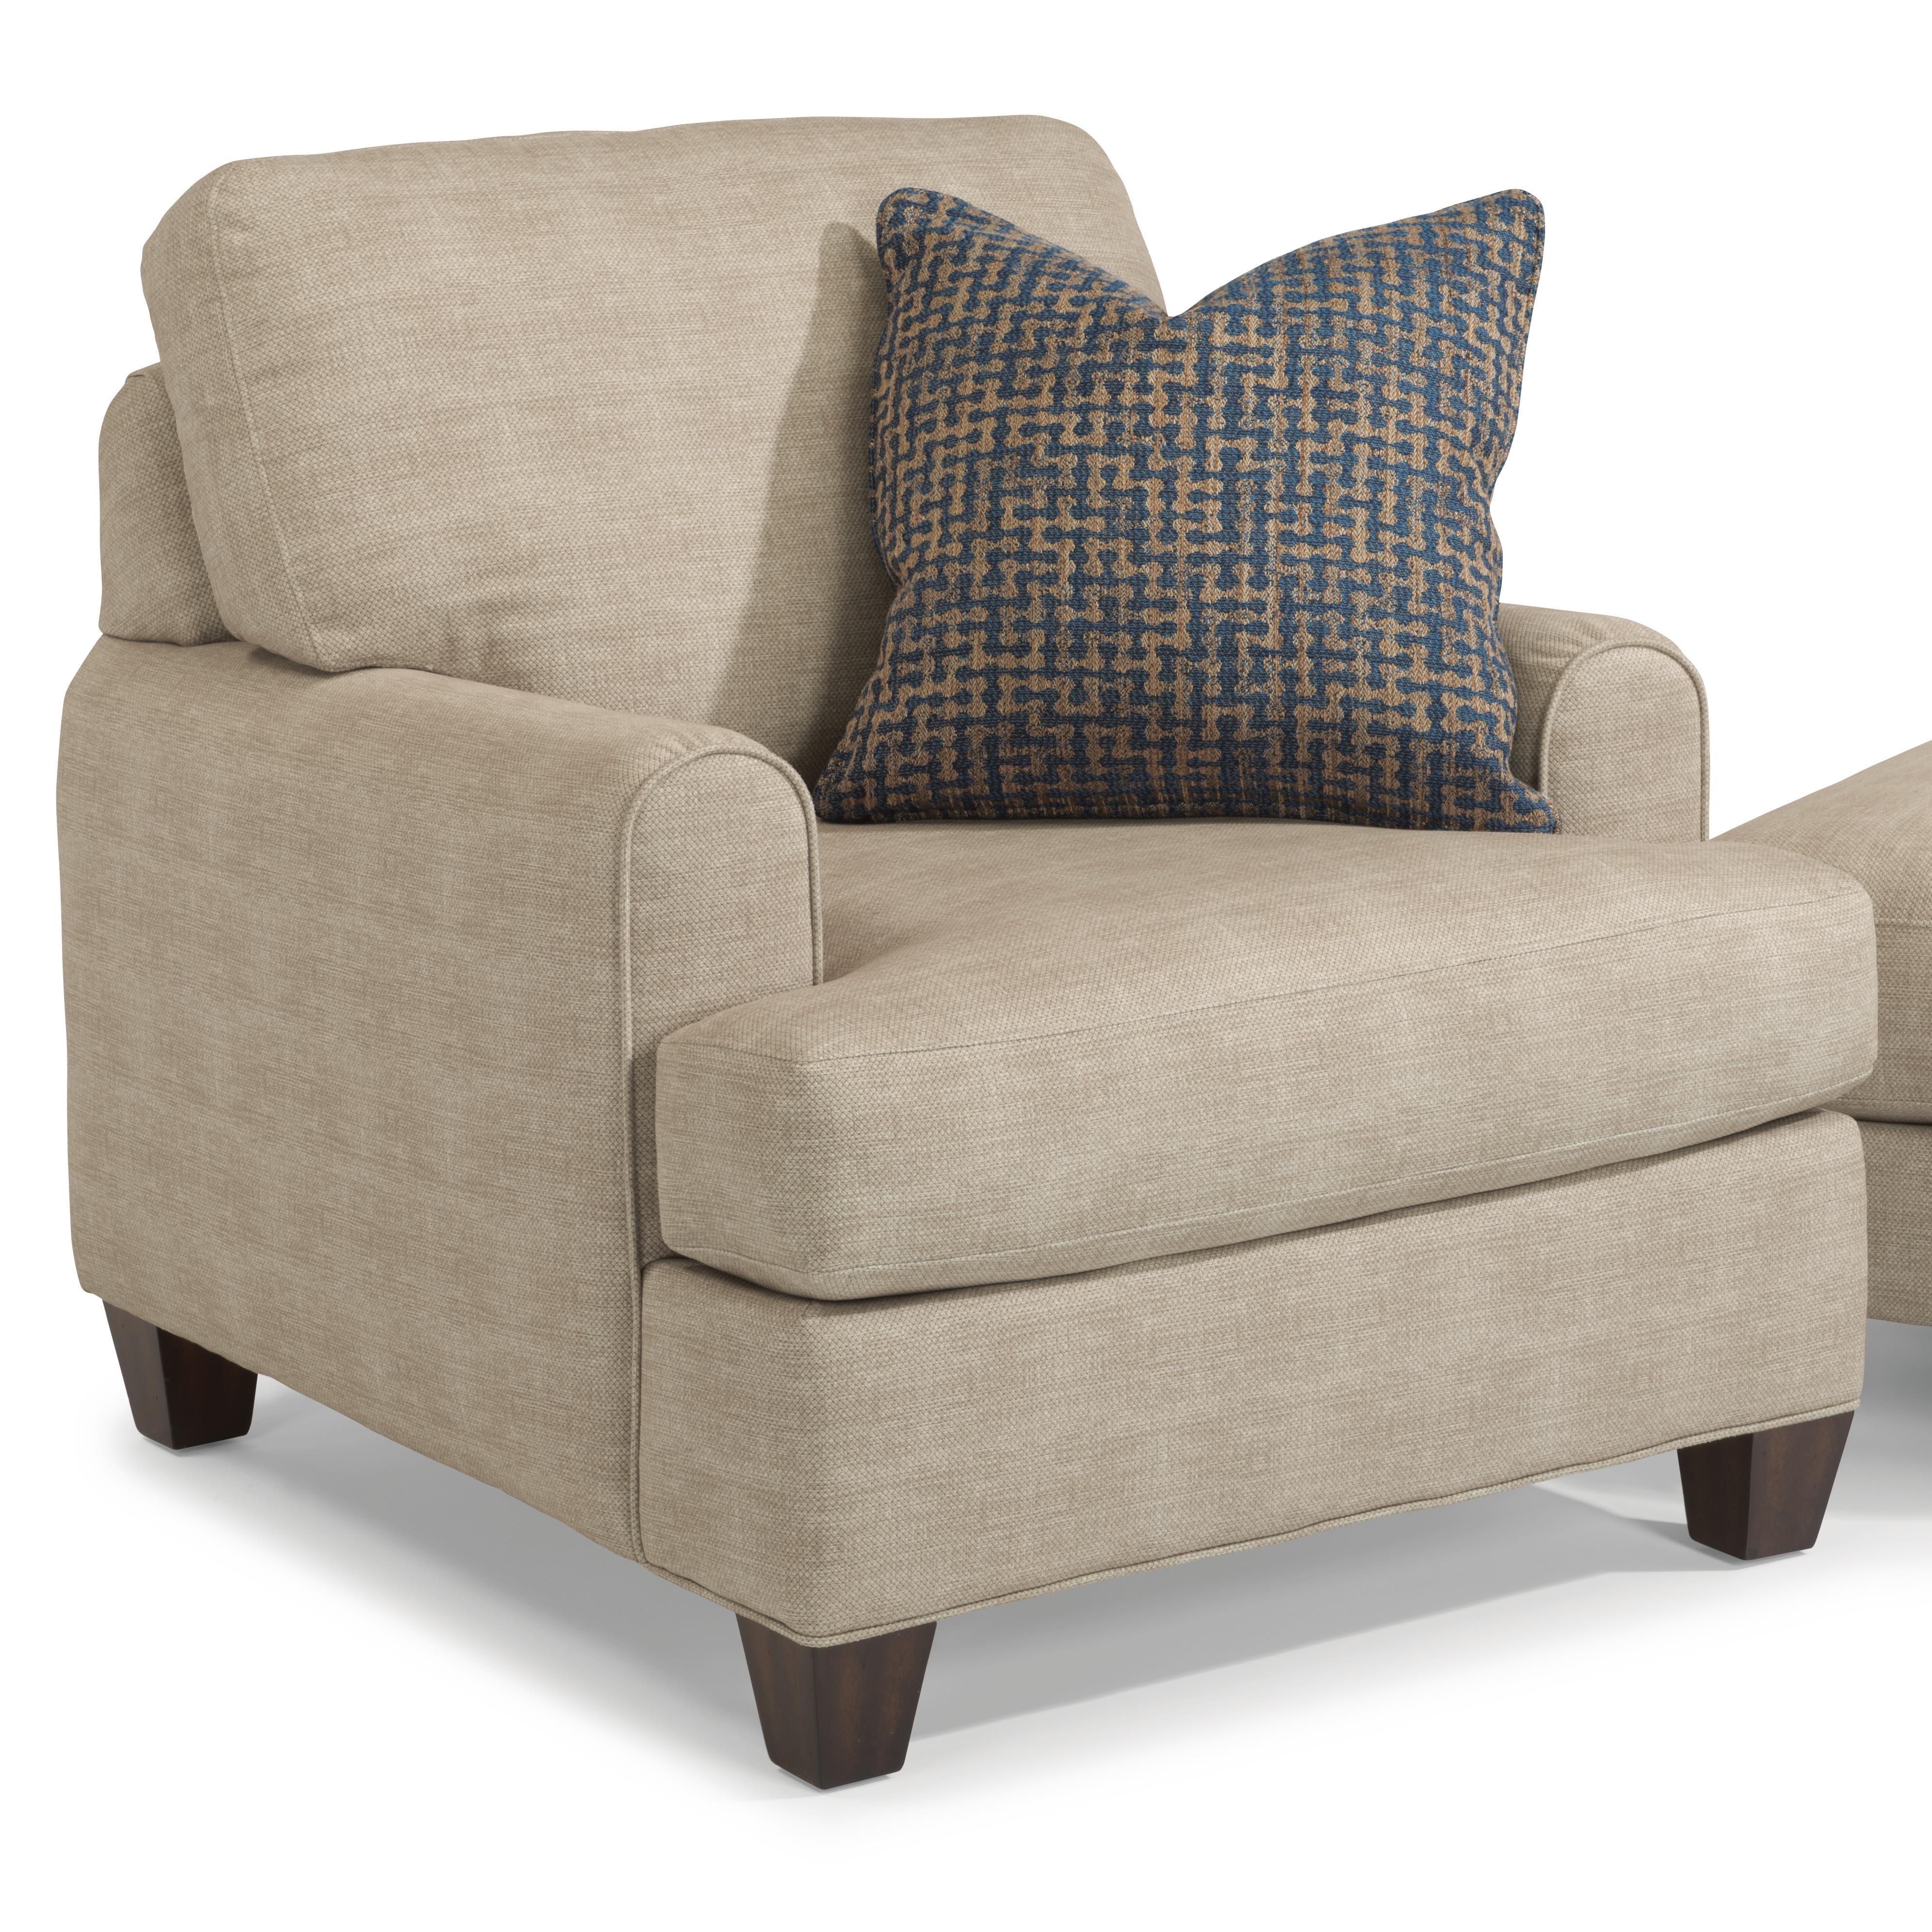 Flexsteel Donatello 5685 Chair - Item Number: 5685-10-120-80